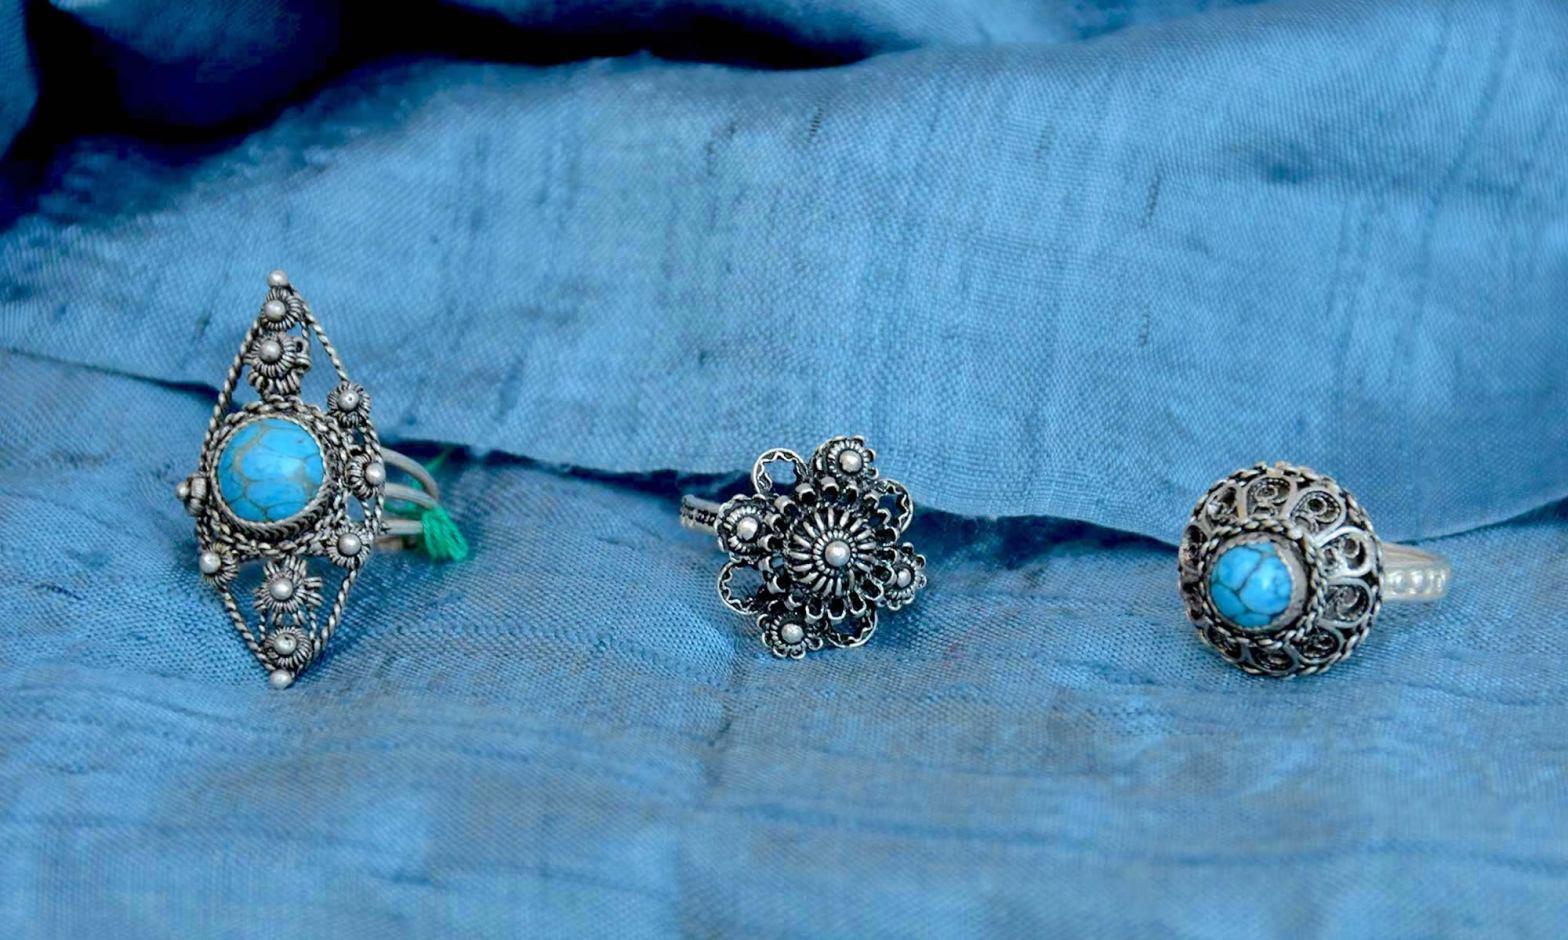 The Art Of Making Croatian Filigree Jewelry Split Croatia Travels With Tricia